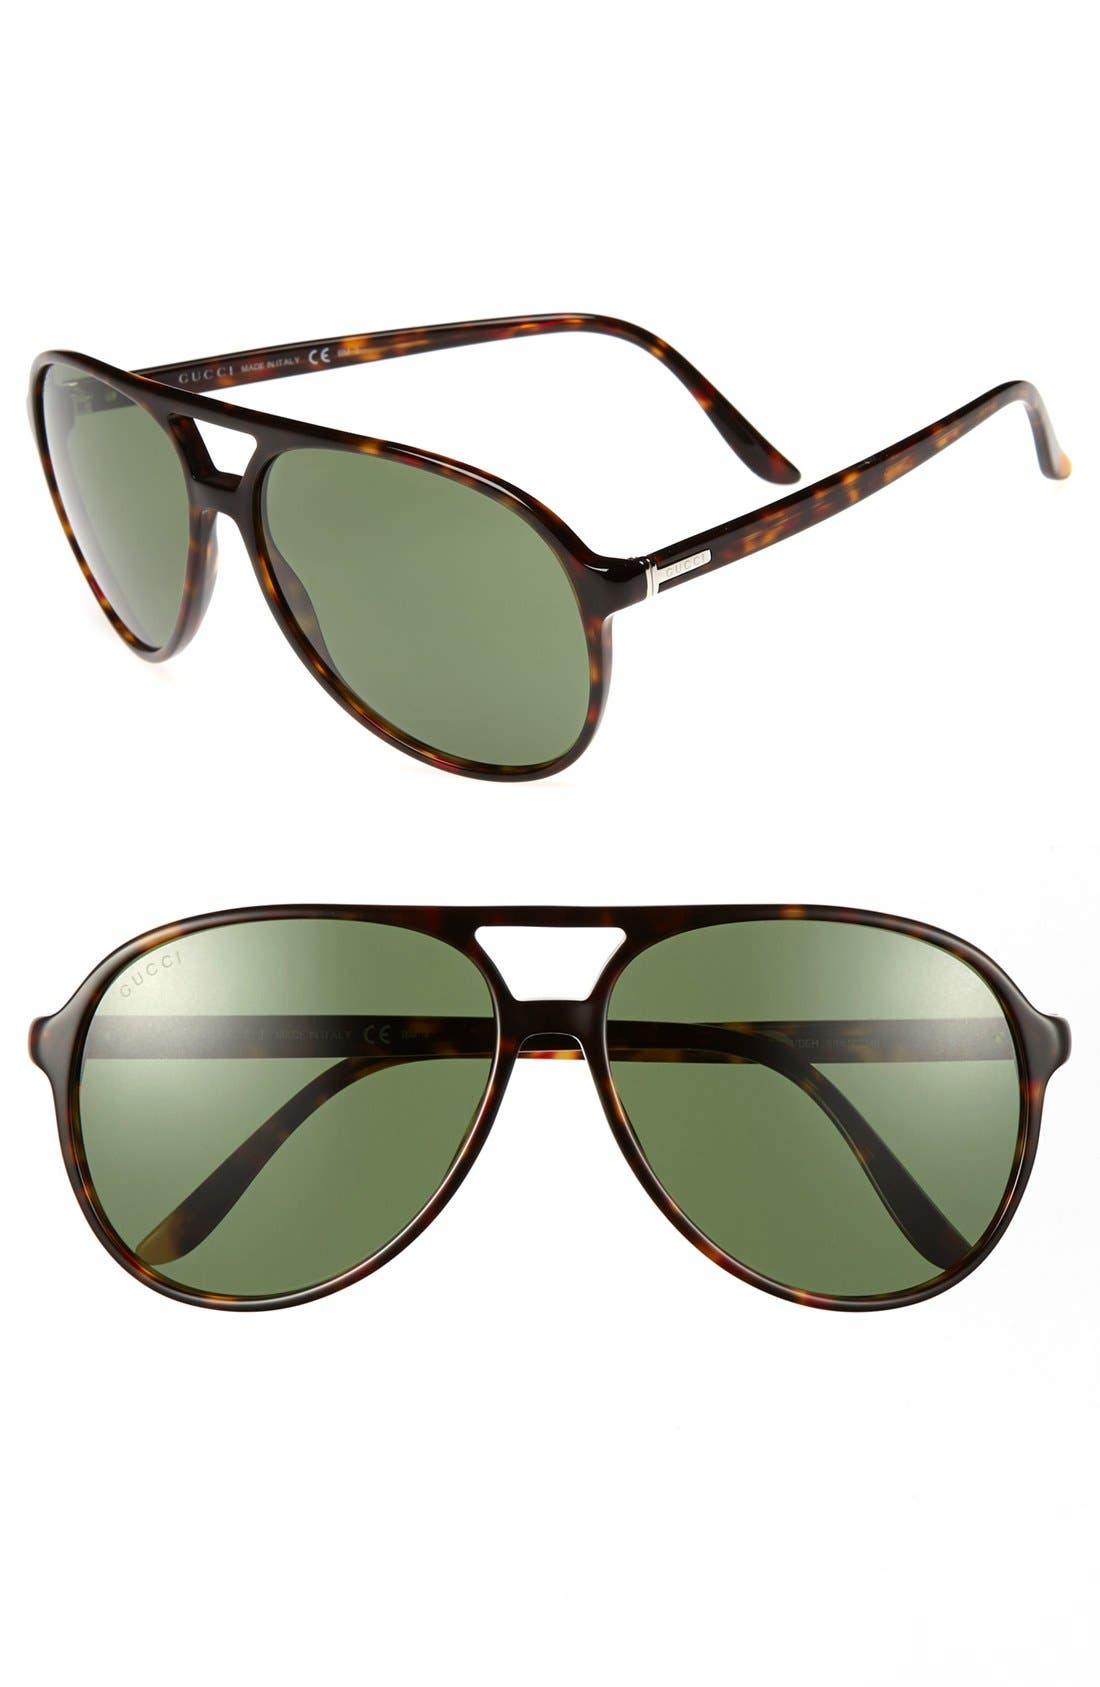 Main Image - Gucci 59mm Aviator Sunglasses